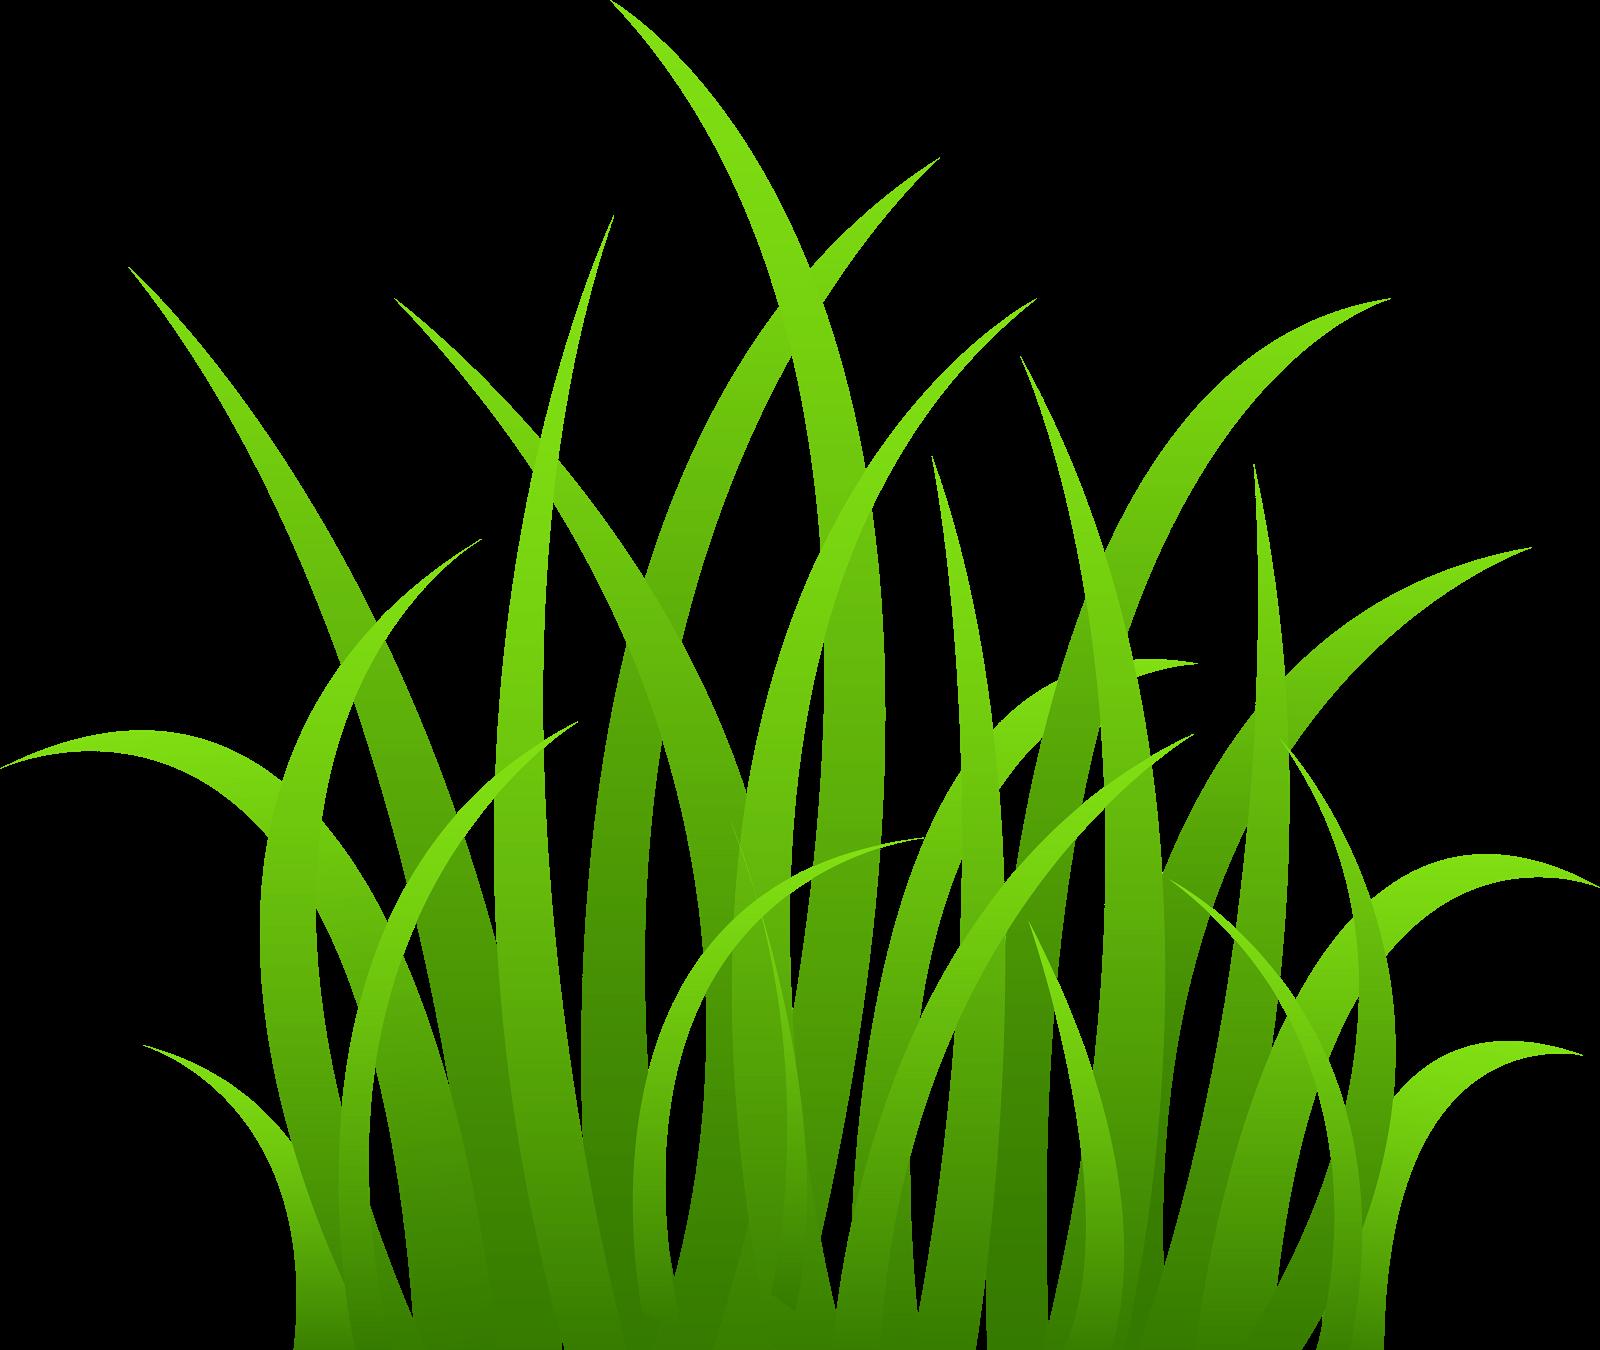 grass clipart free clip art images [ 1600 x 1350 Pixel ]